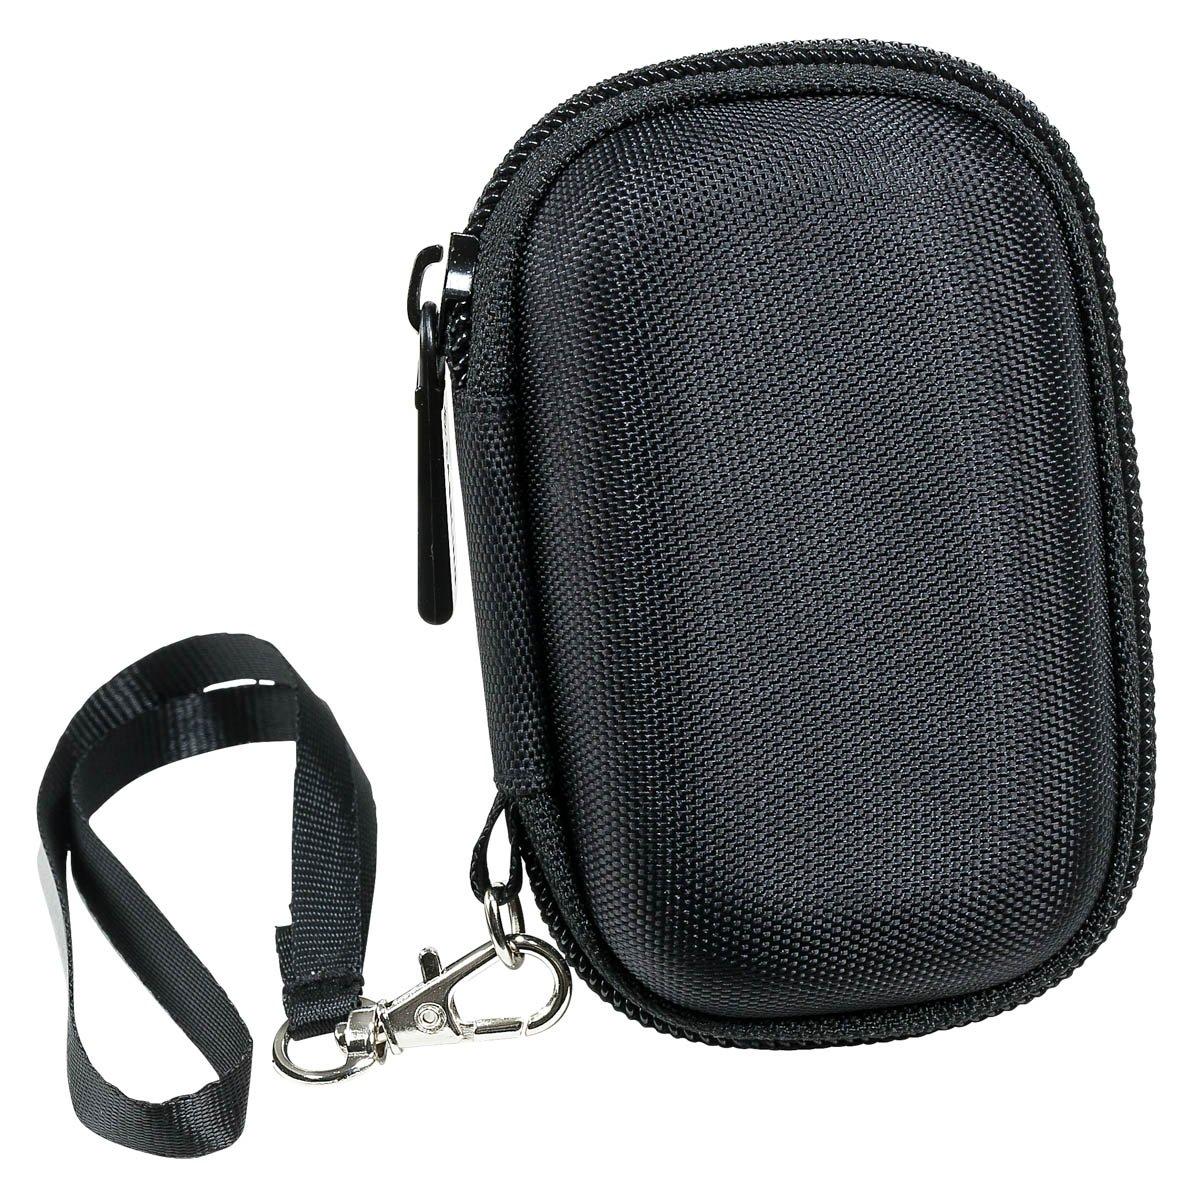 Caseling Carrying Hard Case for Sandisk Clip Jam / Sansa Clip Plus / Clip Sport MP3 Player. - Apple Ipod Nano, Ipod Shuffle. – Black